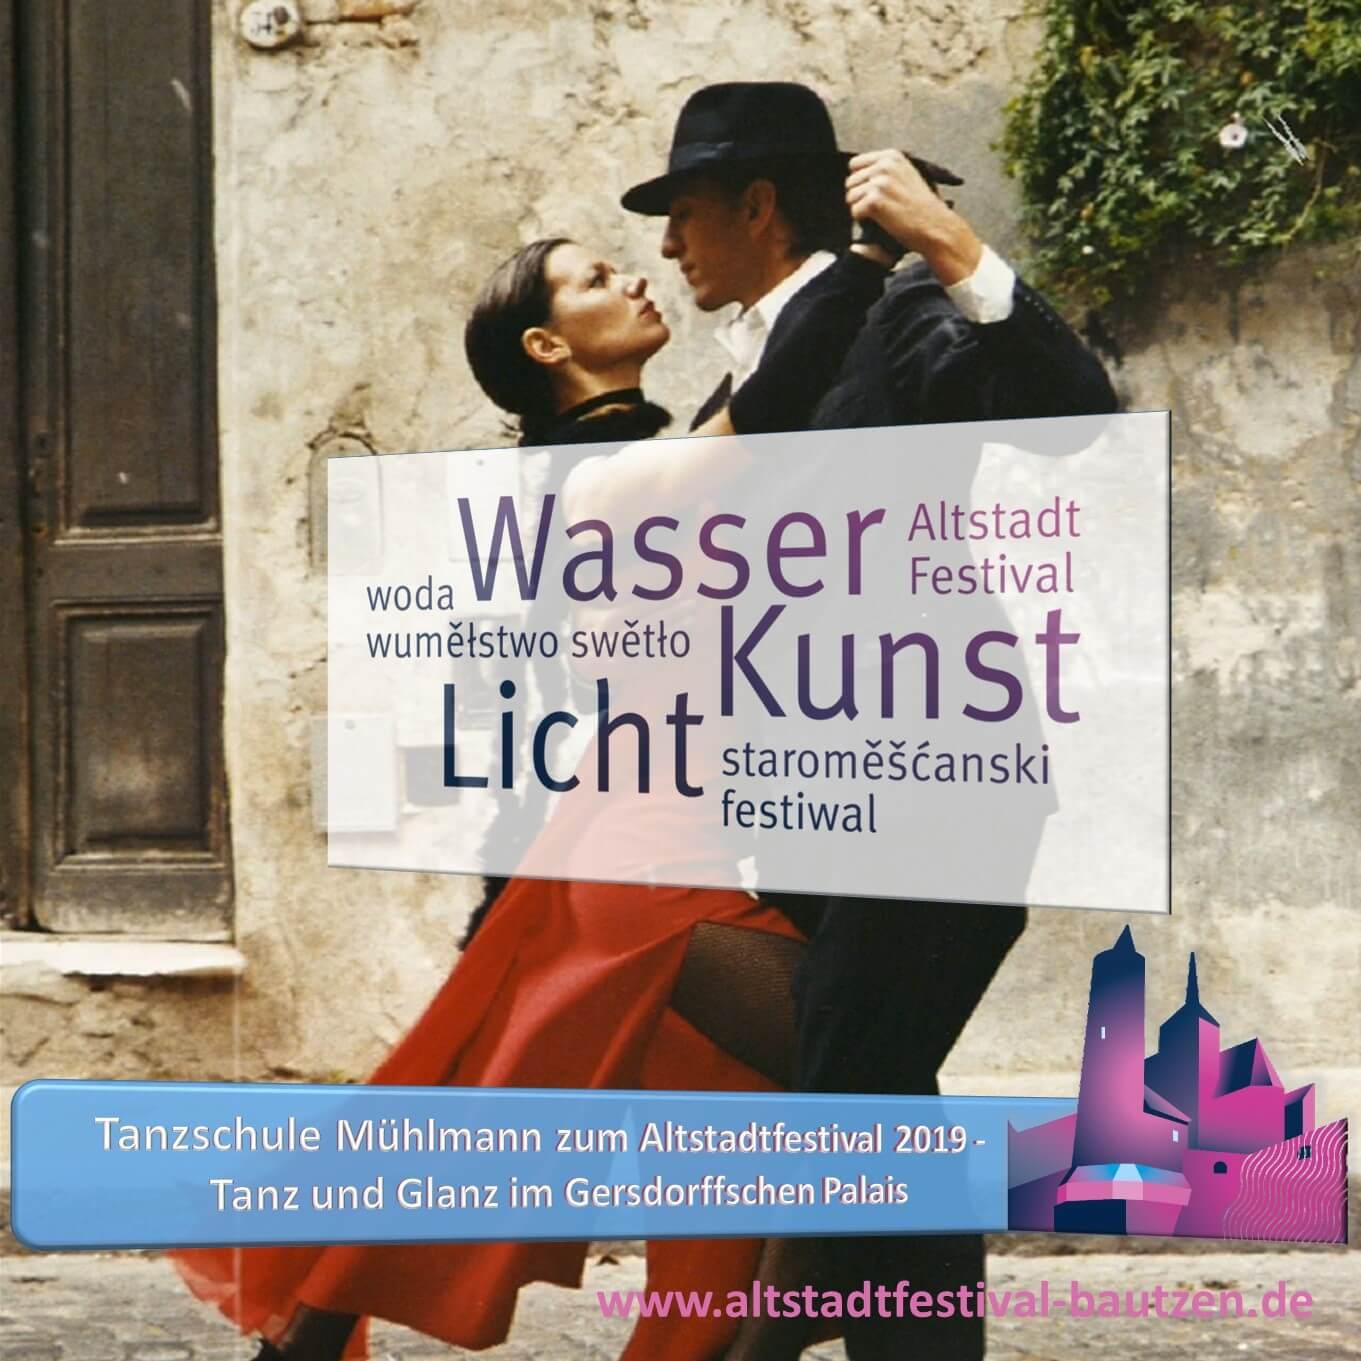 Beitrag Tanzschule Mühlmann zum Altstadtfestival 2019